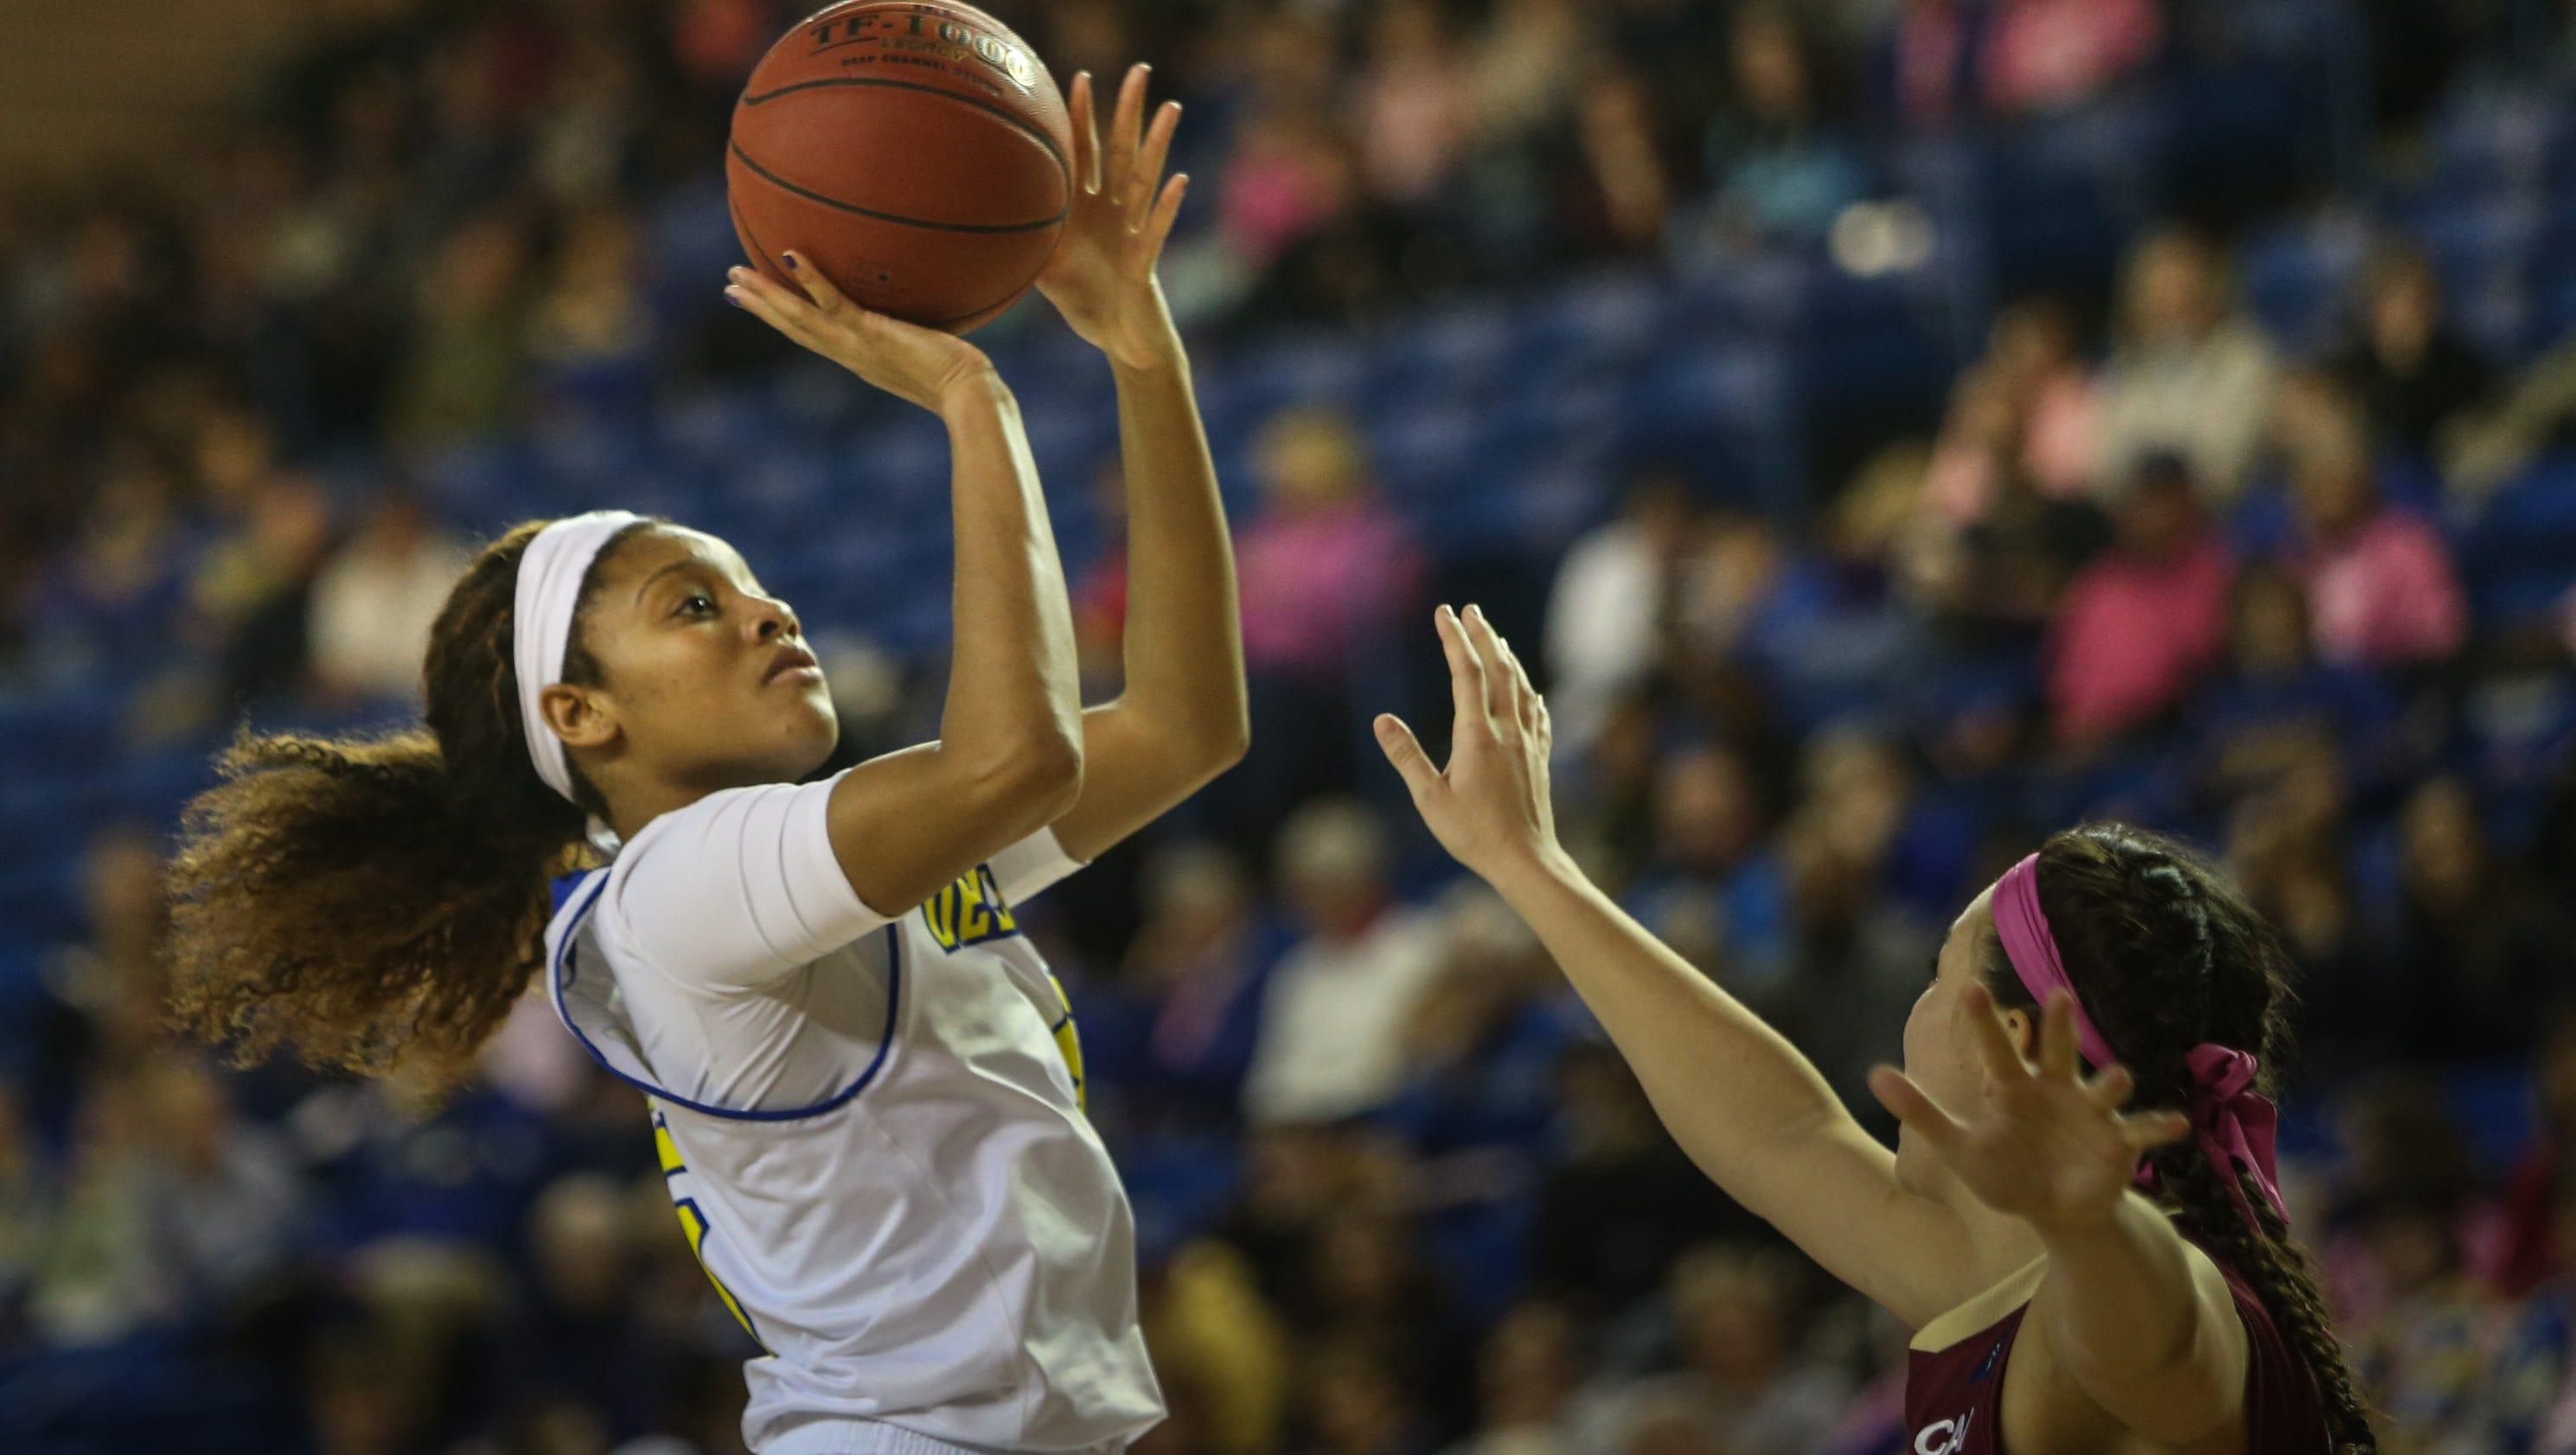 UD women take command in 2nd half to beat Charleston